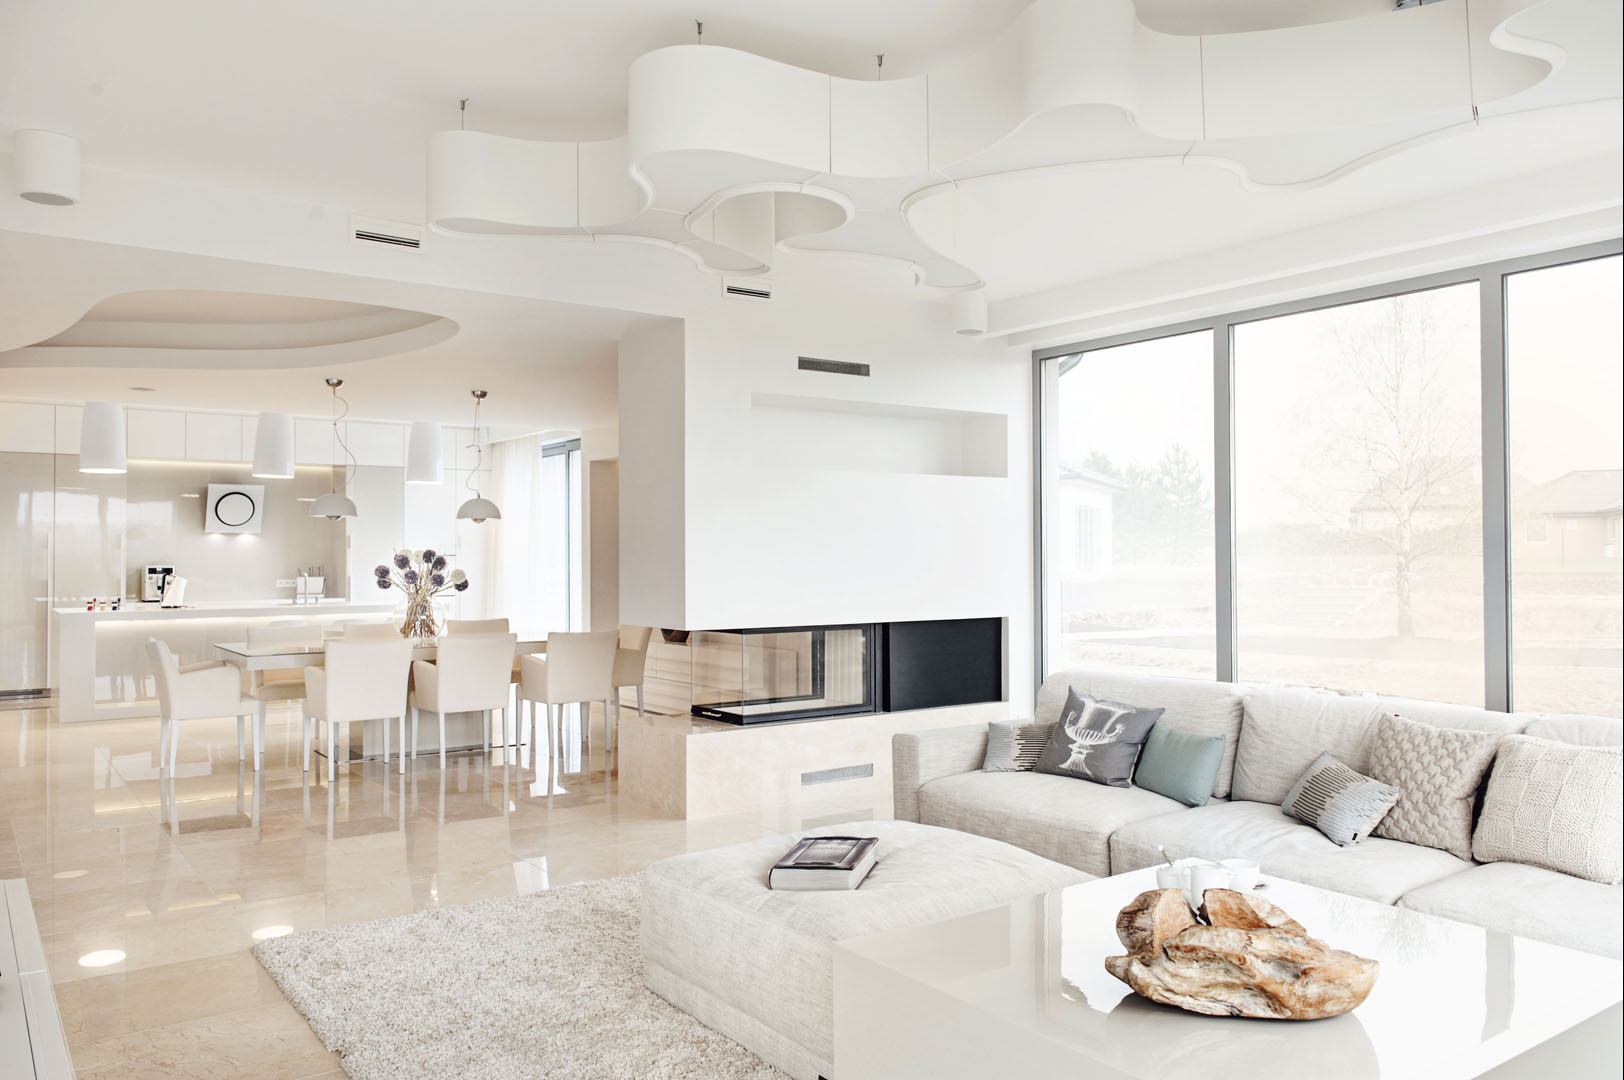 Dom prywatny 2012 - 03 sofa lampa kominek jadalnia kuchnia marmur